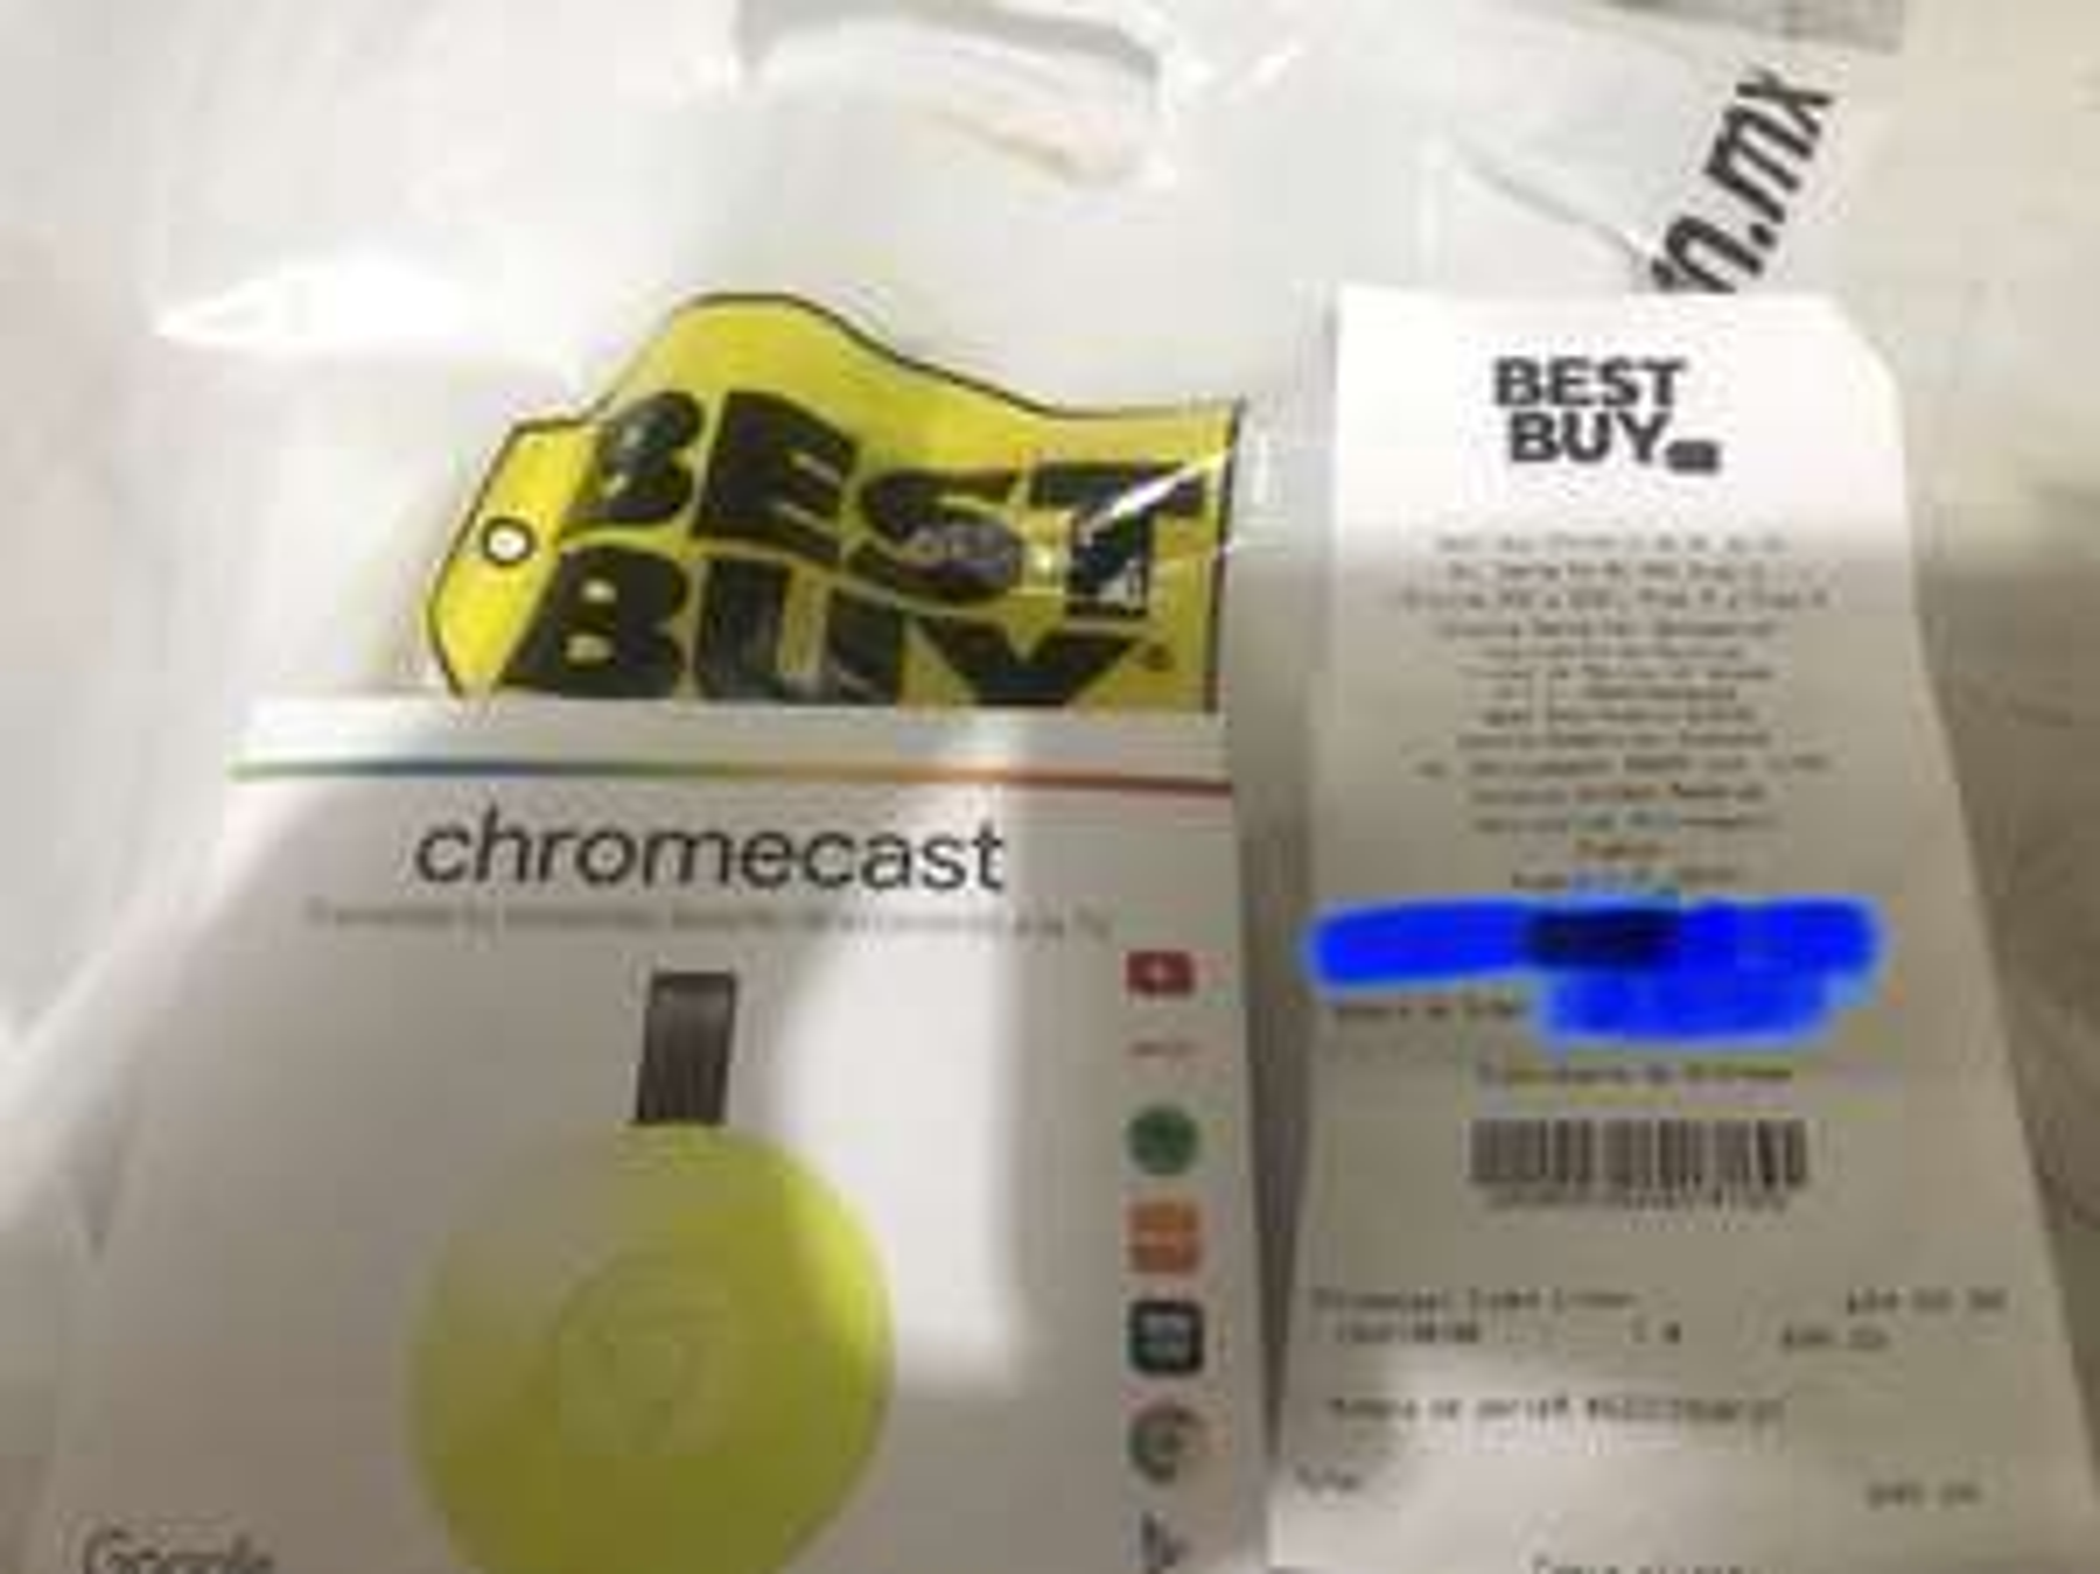 Best Buy: Chromecast de 899 a 699